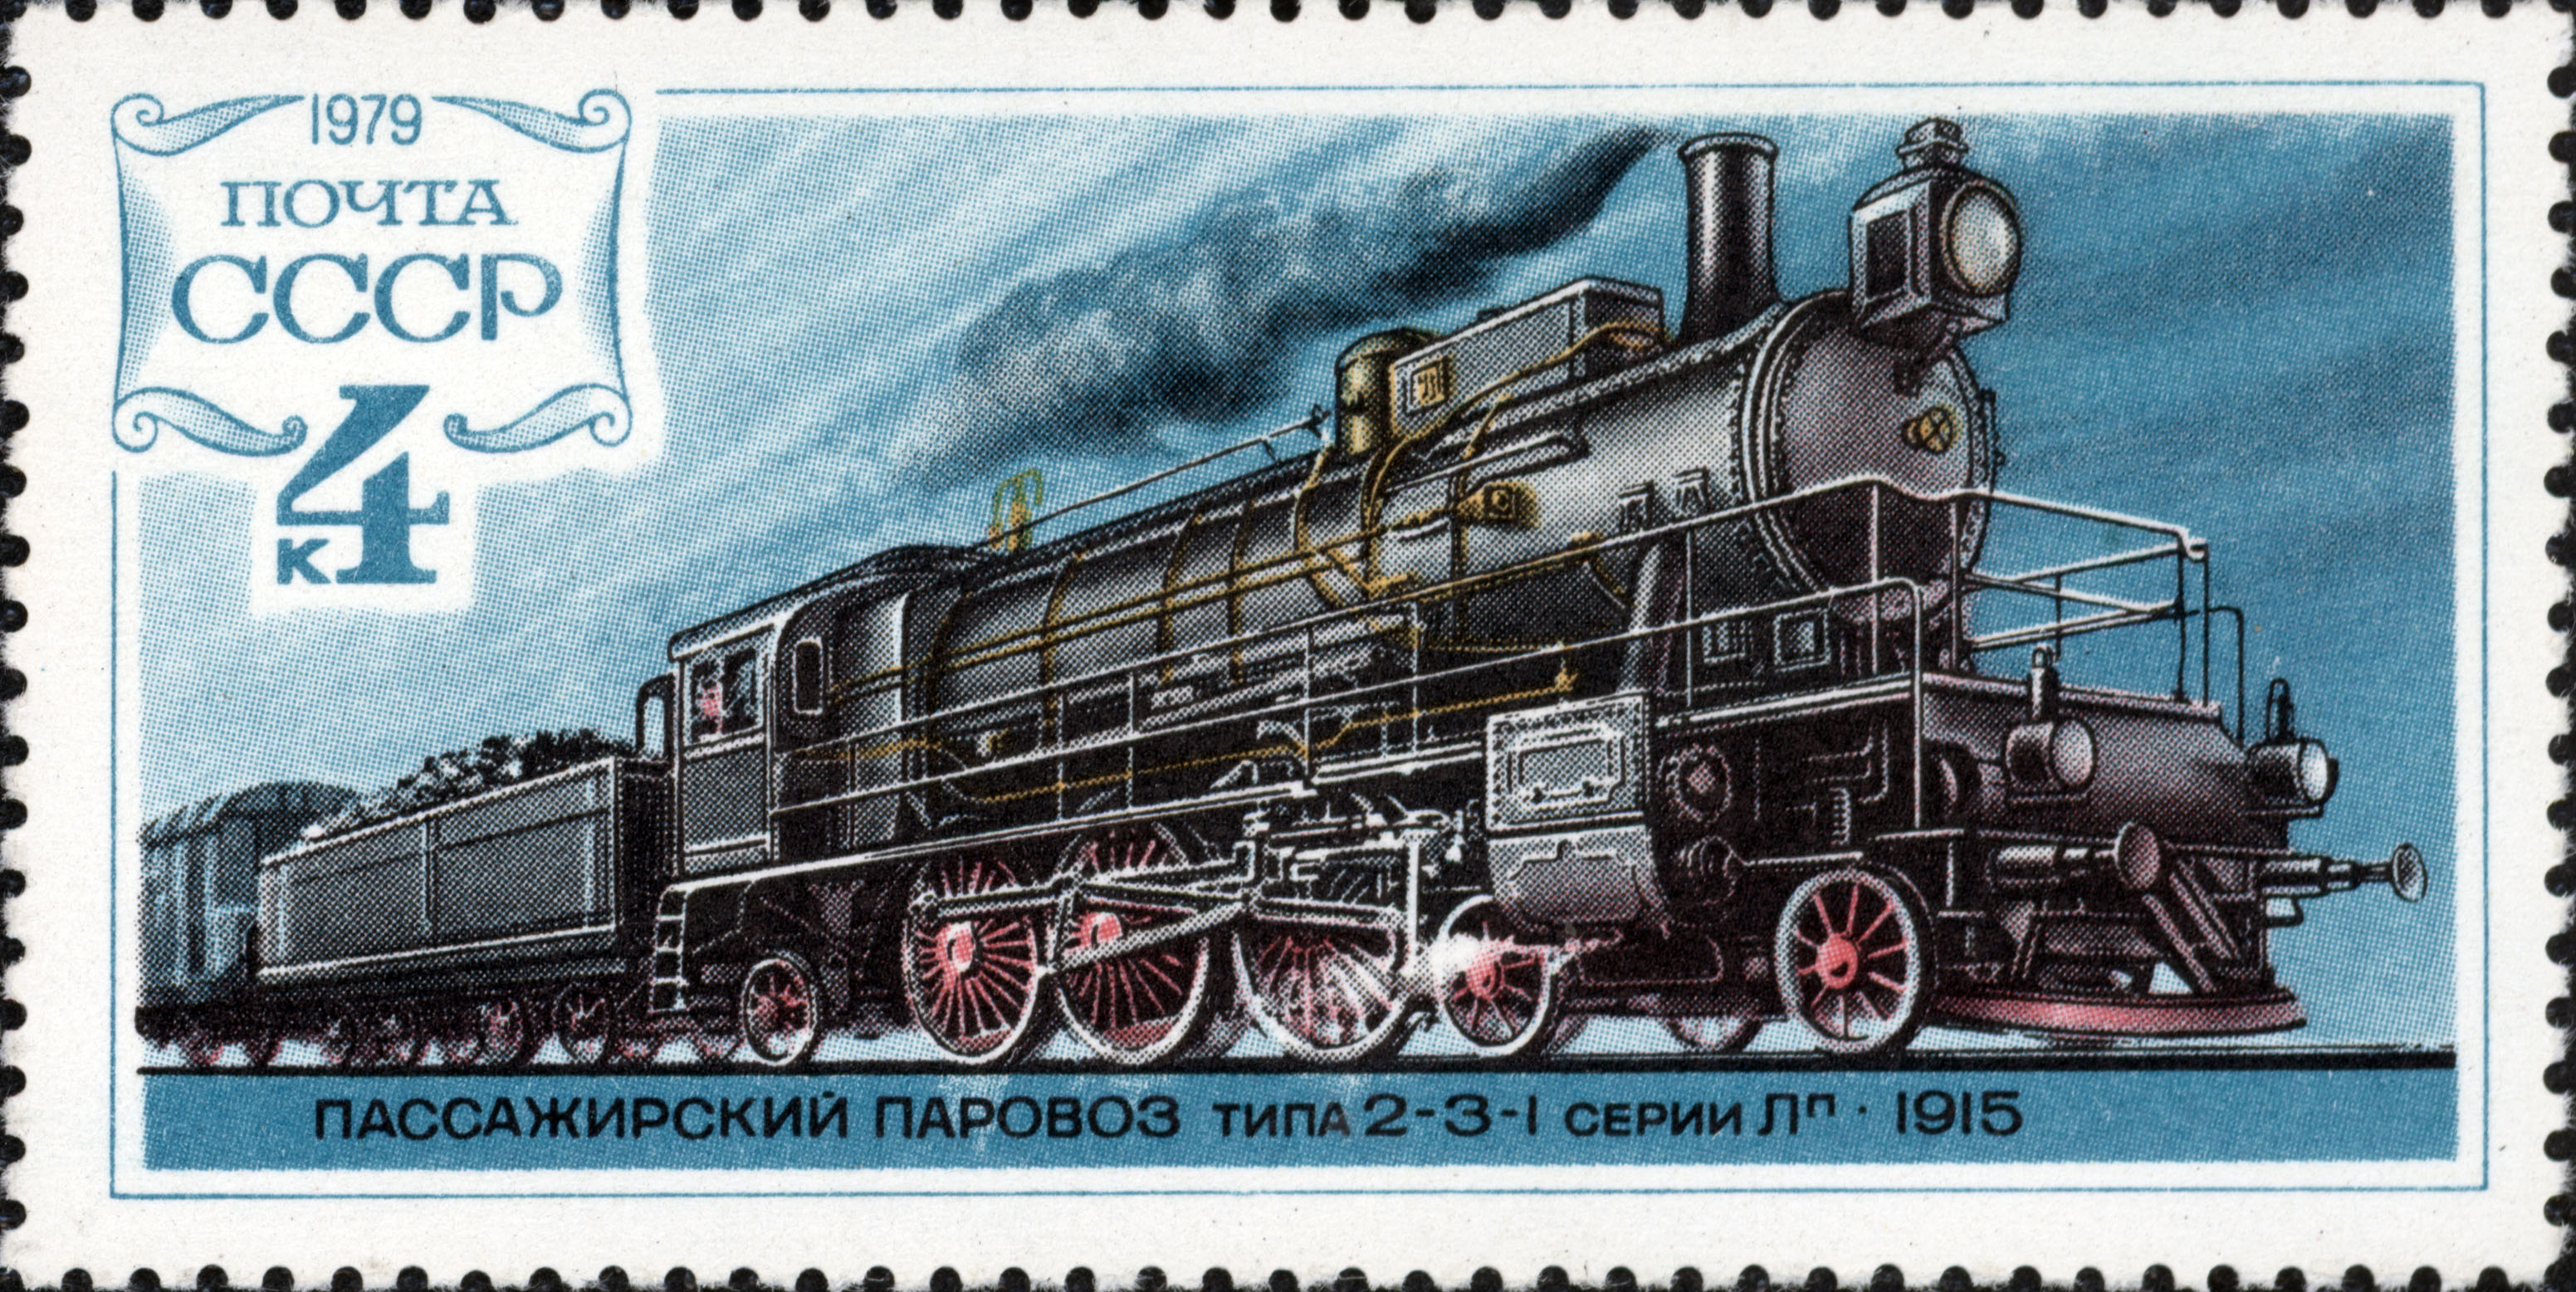 File:Steam Locomotive Lp type 2-3-1 on 1979 USSR Stamp.jpg ...